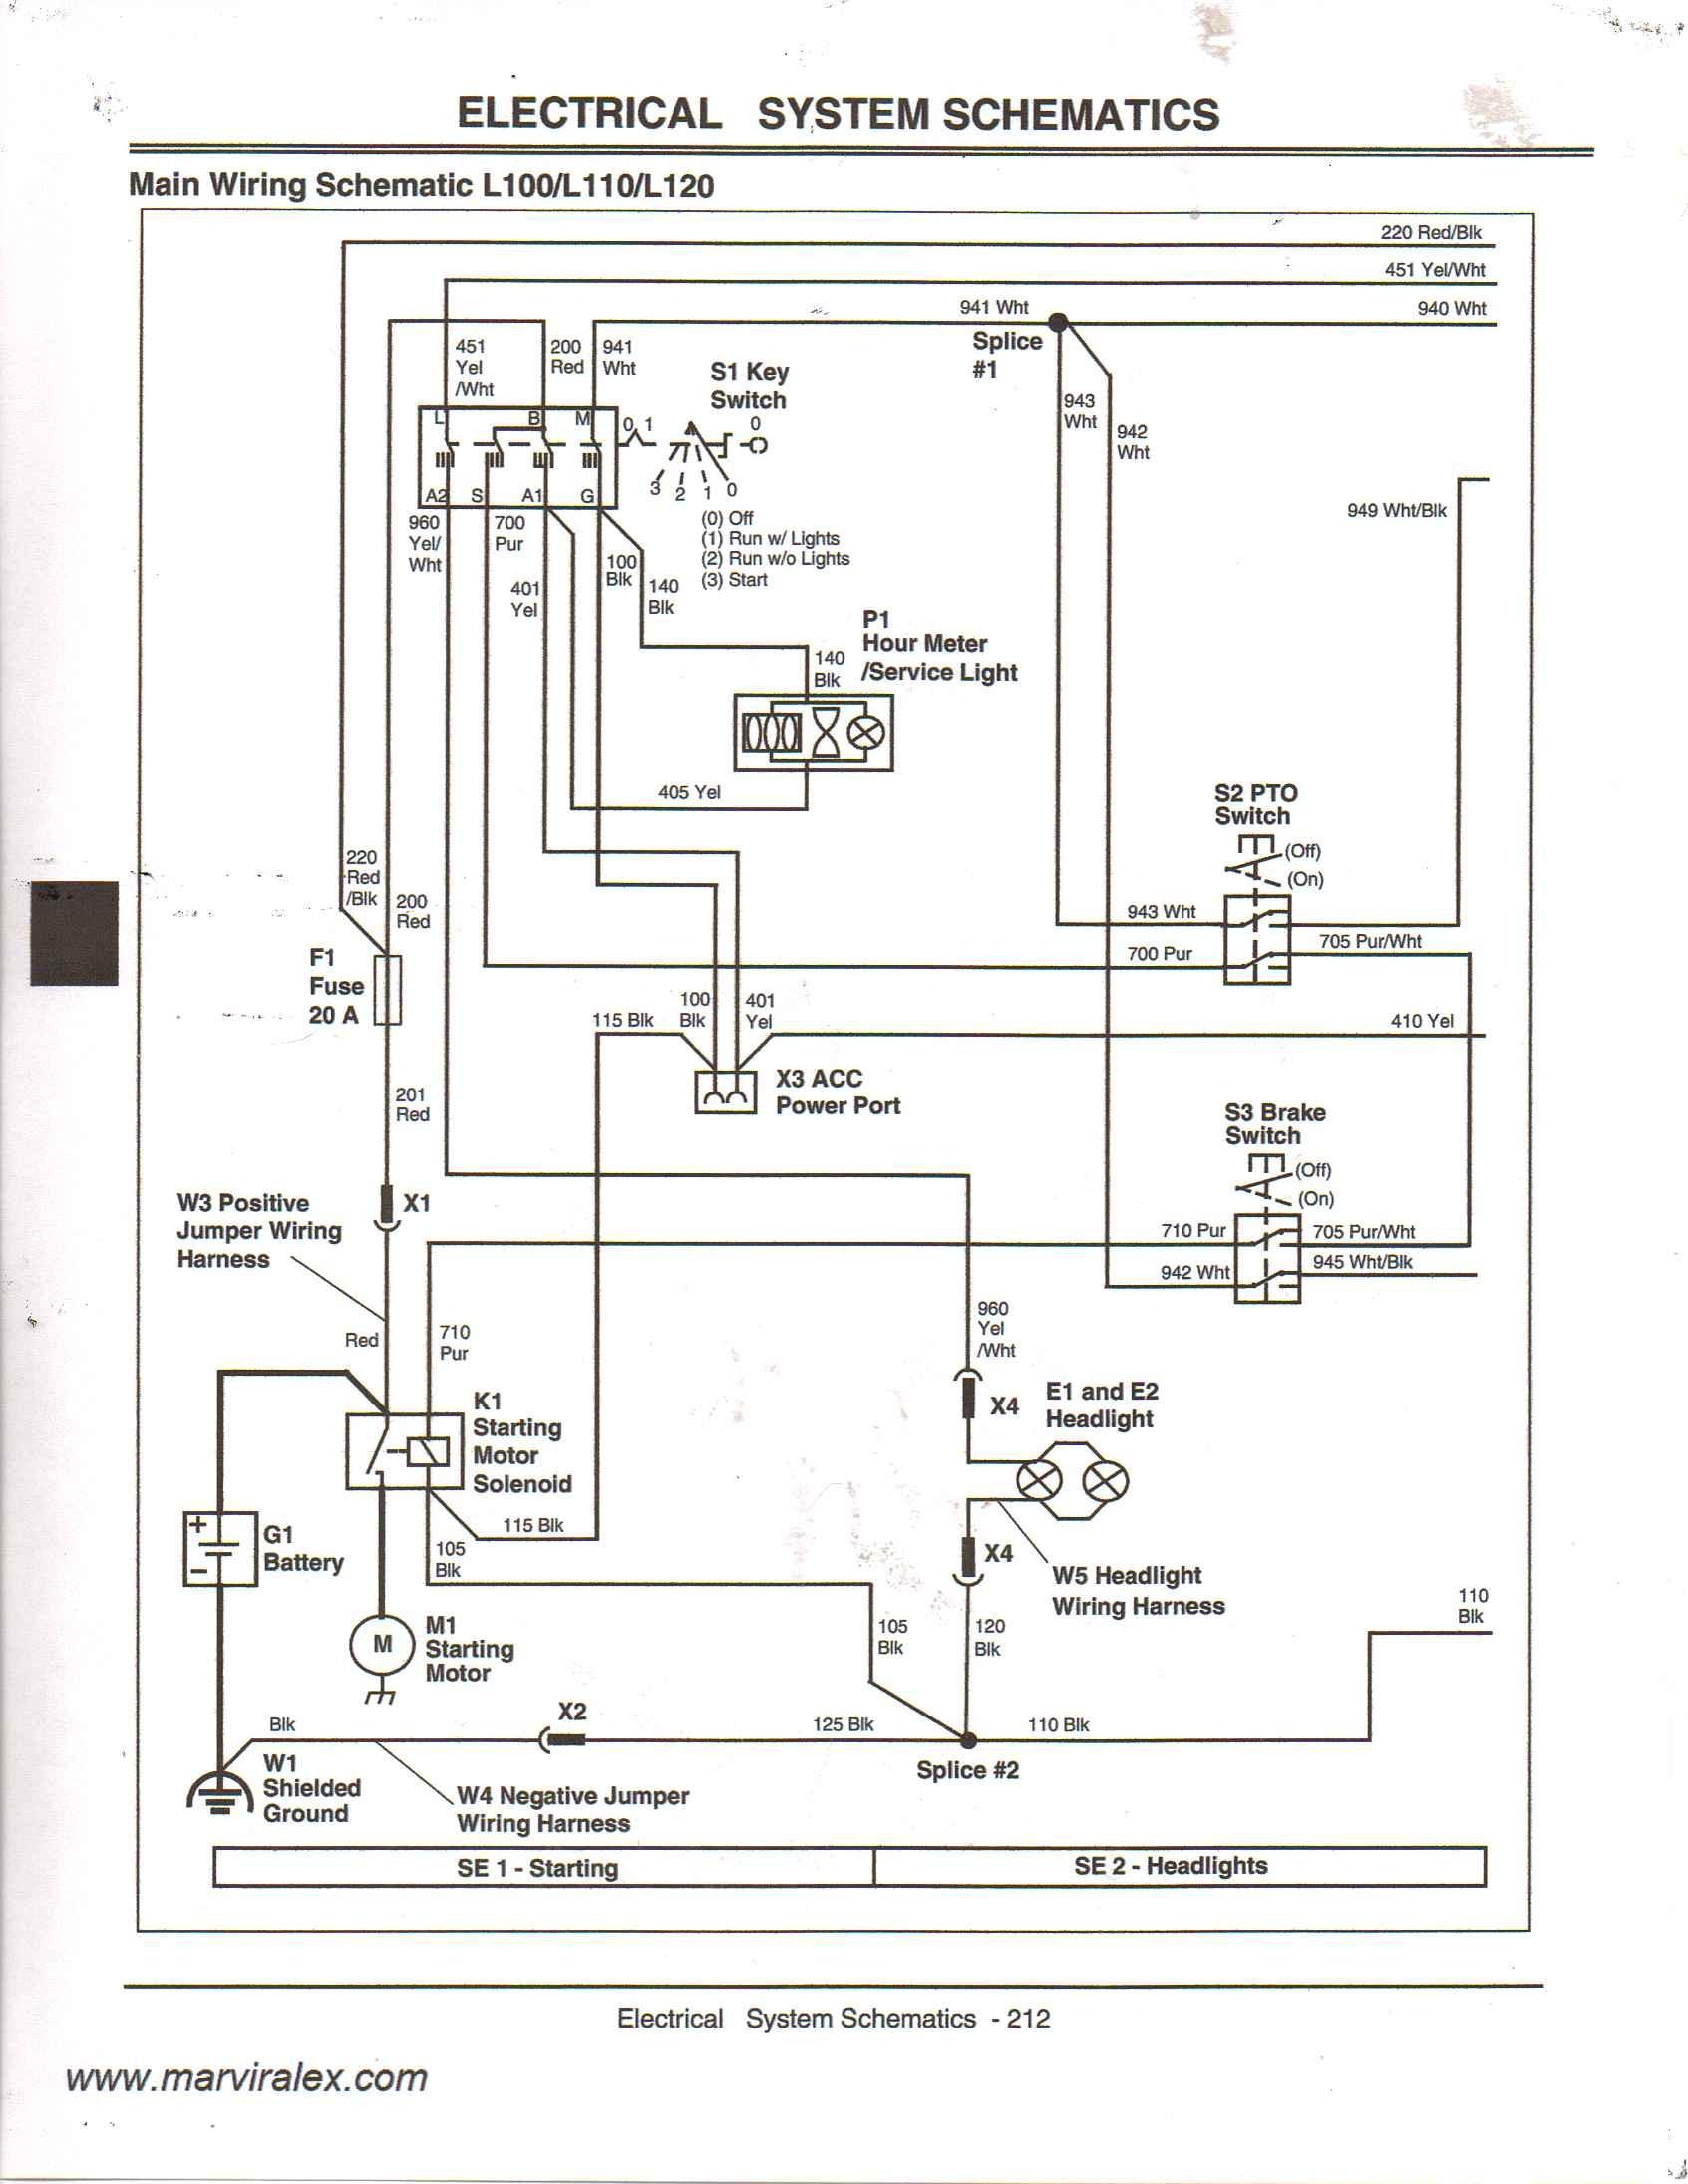 John Deere Gx345 Wiring Diagram Cb 4290] for John Deere 1050 Tractor Wiring Diagram Of John Deere Gx345 Wiring Diagram